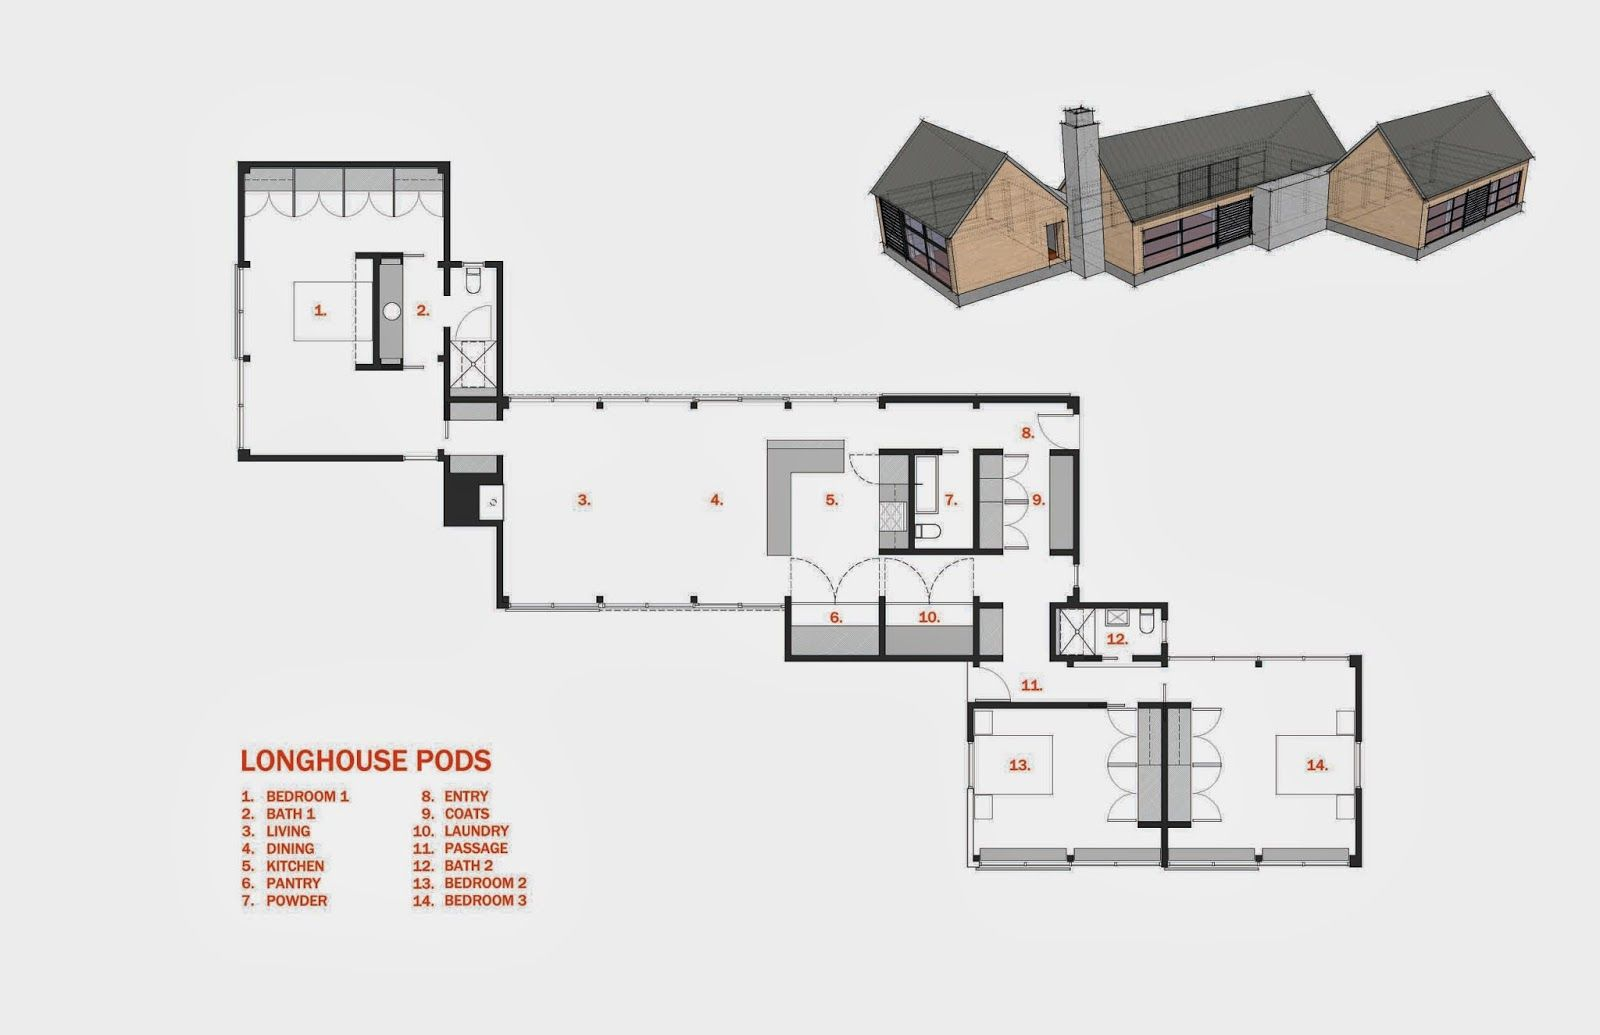 Long House Floor Plans Design Ranch Skinny Log Home Longhouse Pods Home Design Floor Plans Barn House Plans House Floor Plans